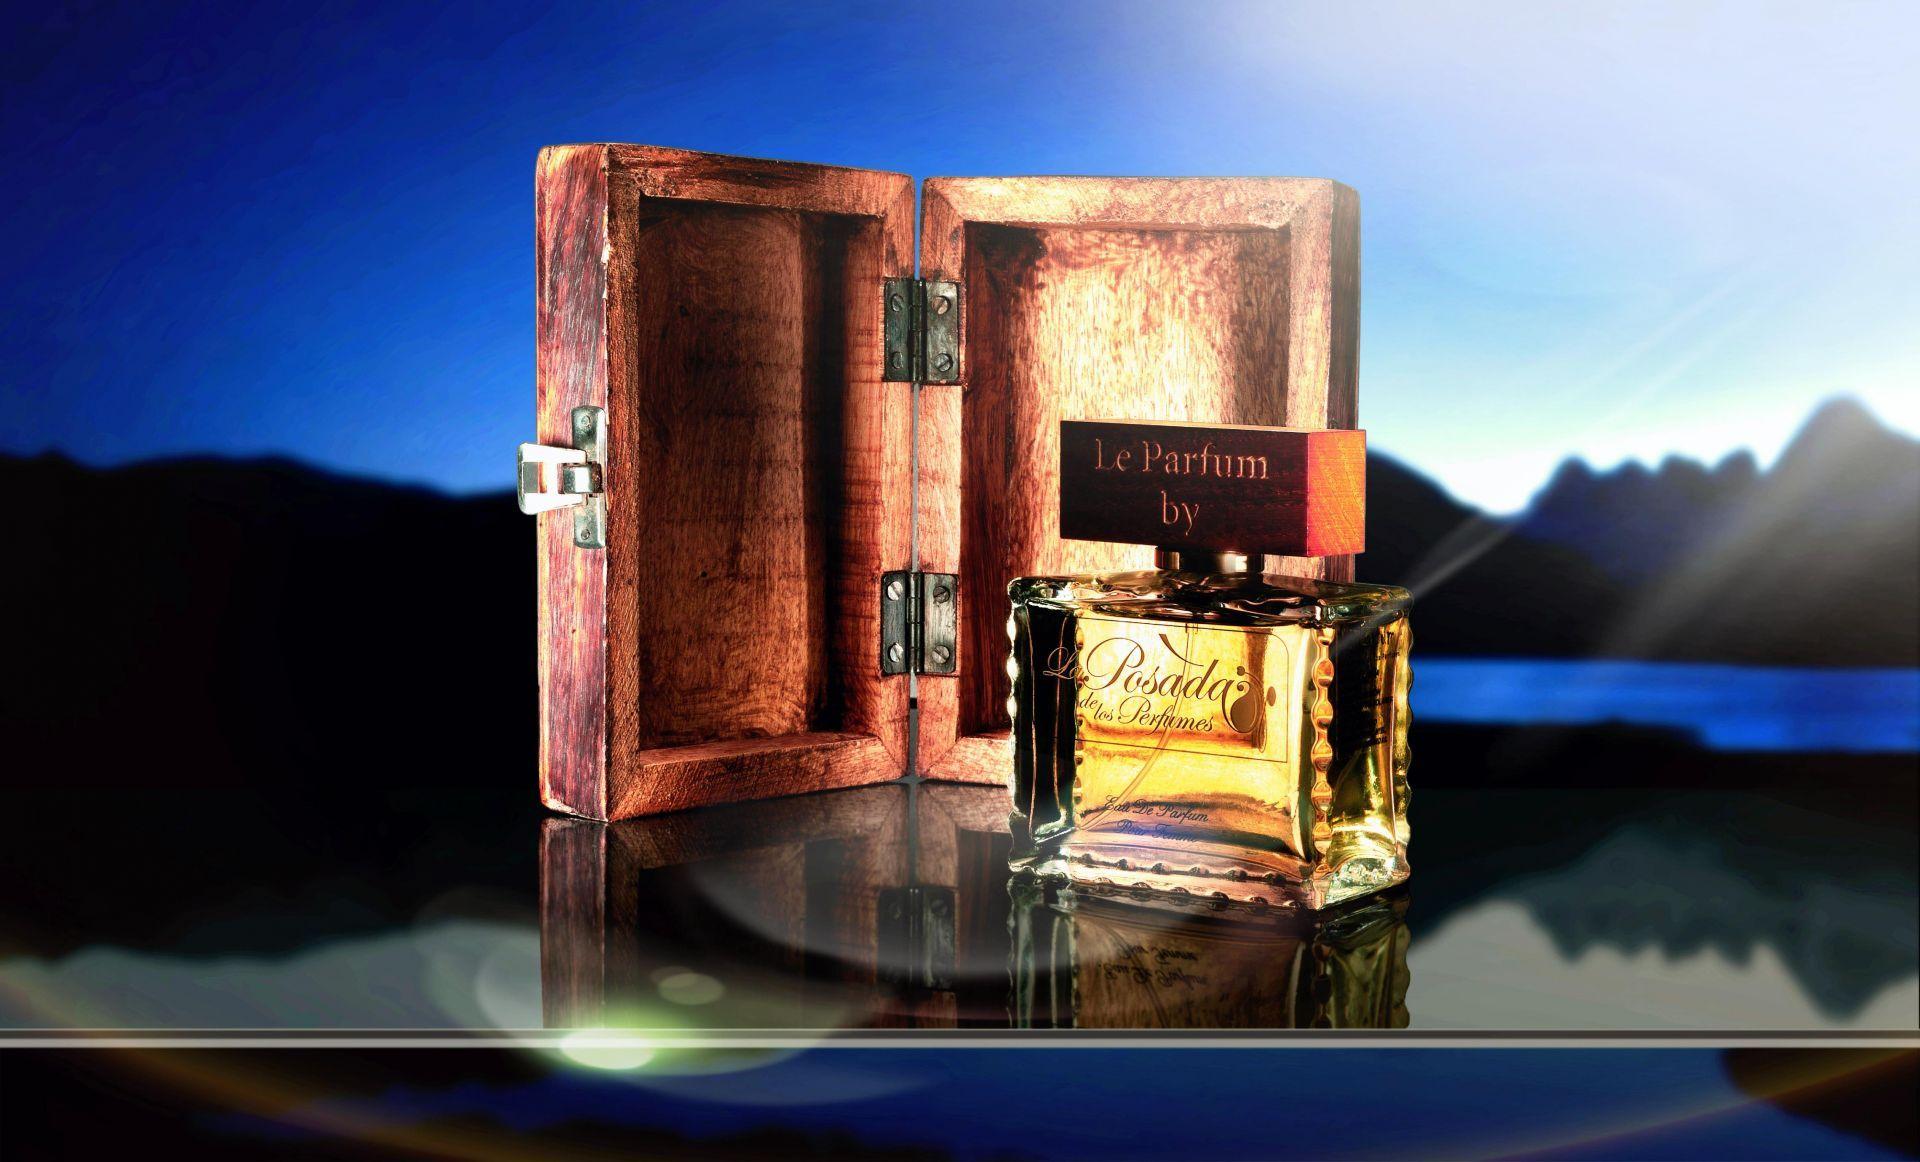 Perfume presentado en caja de madera hecha a mano